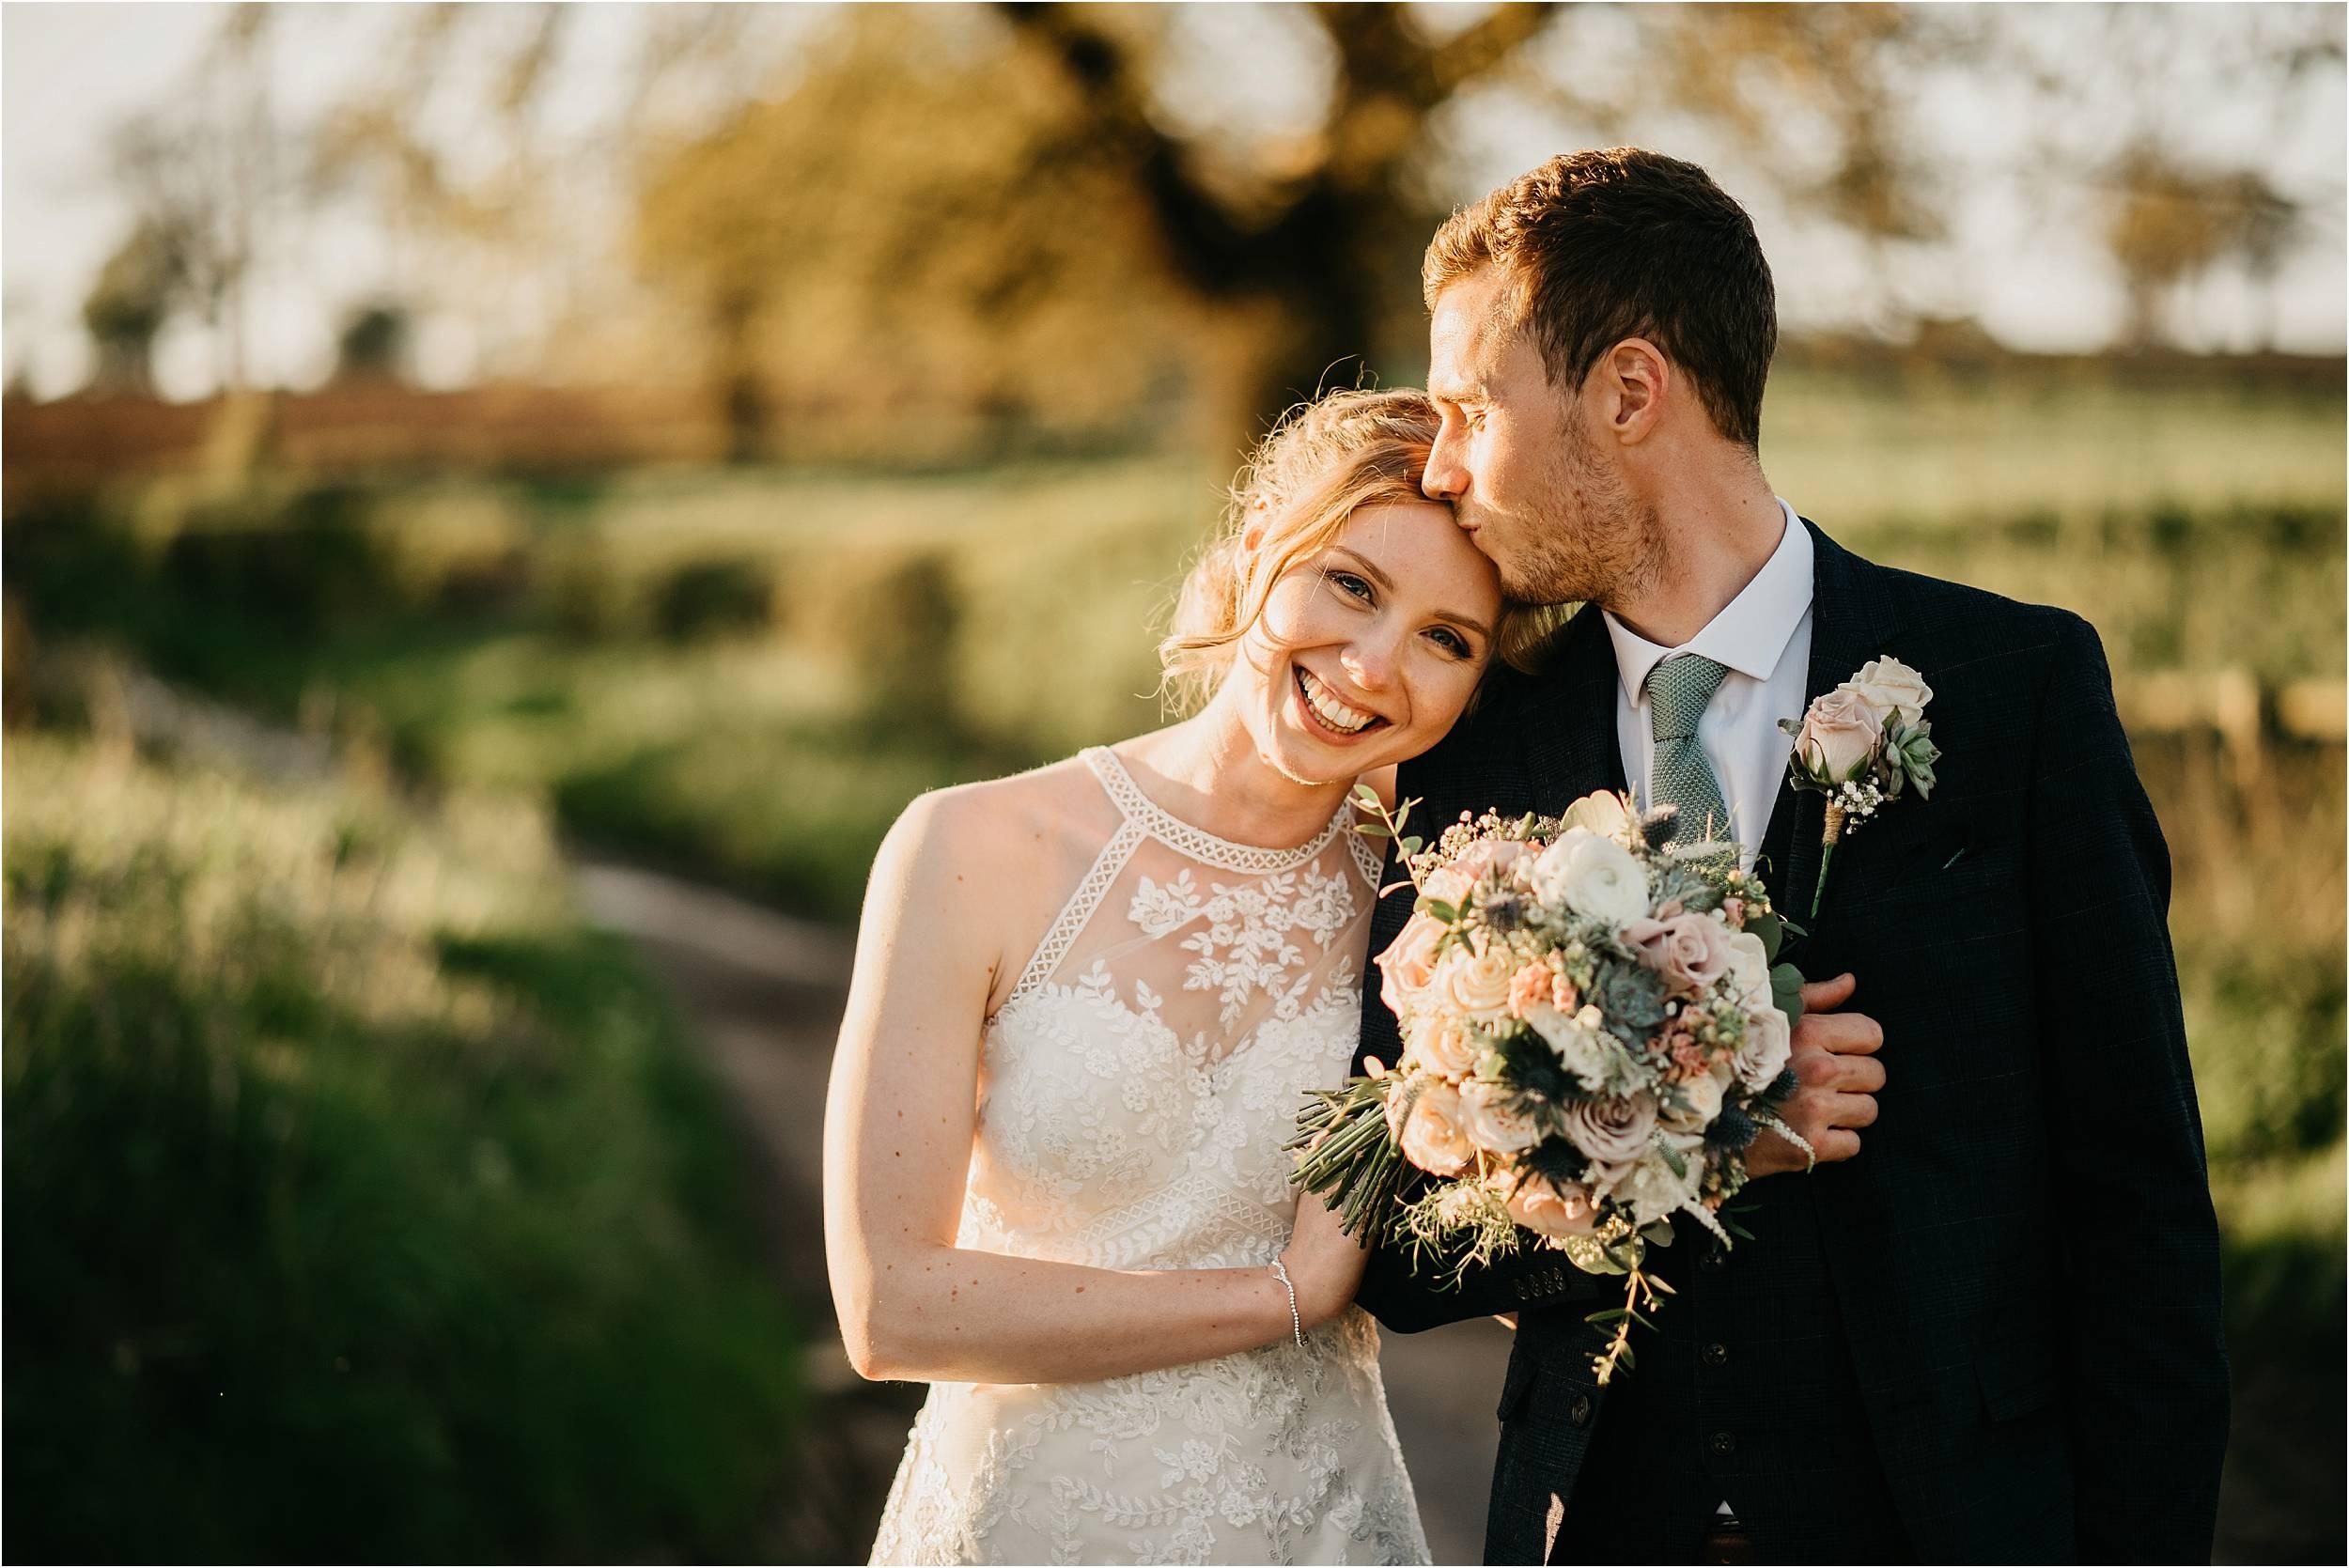 Kedleston Country House Wedding Photography_0093.jpg